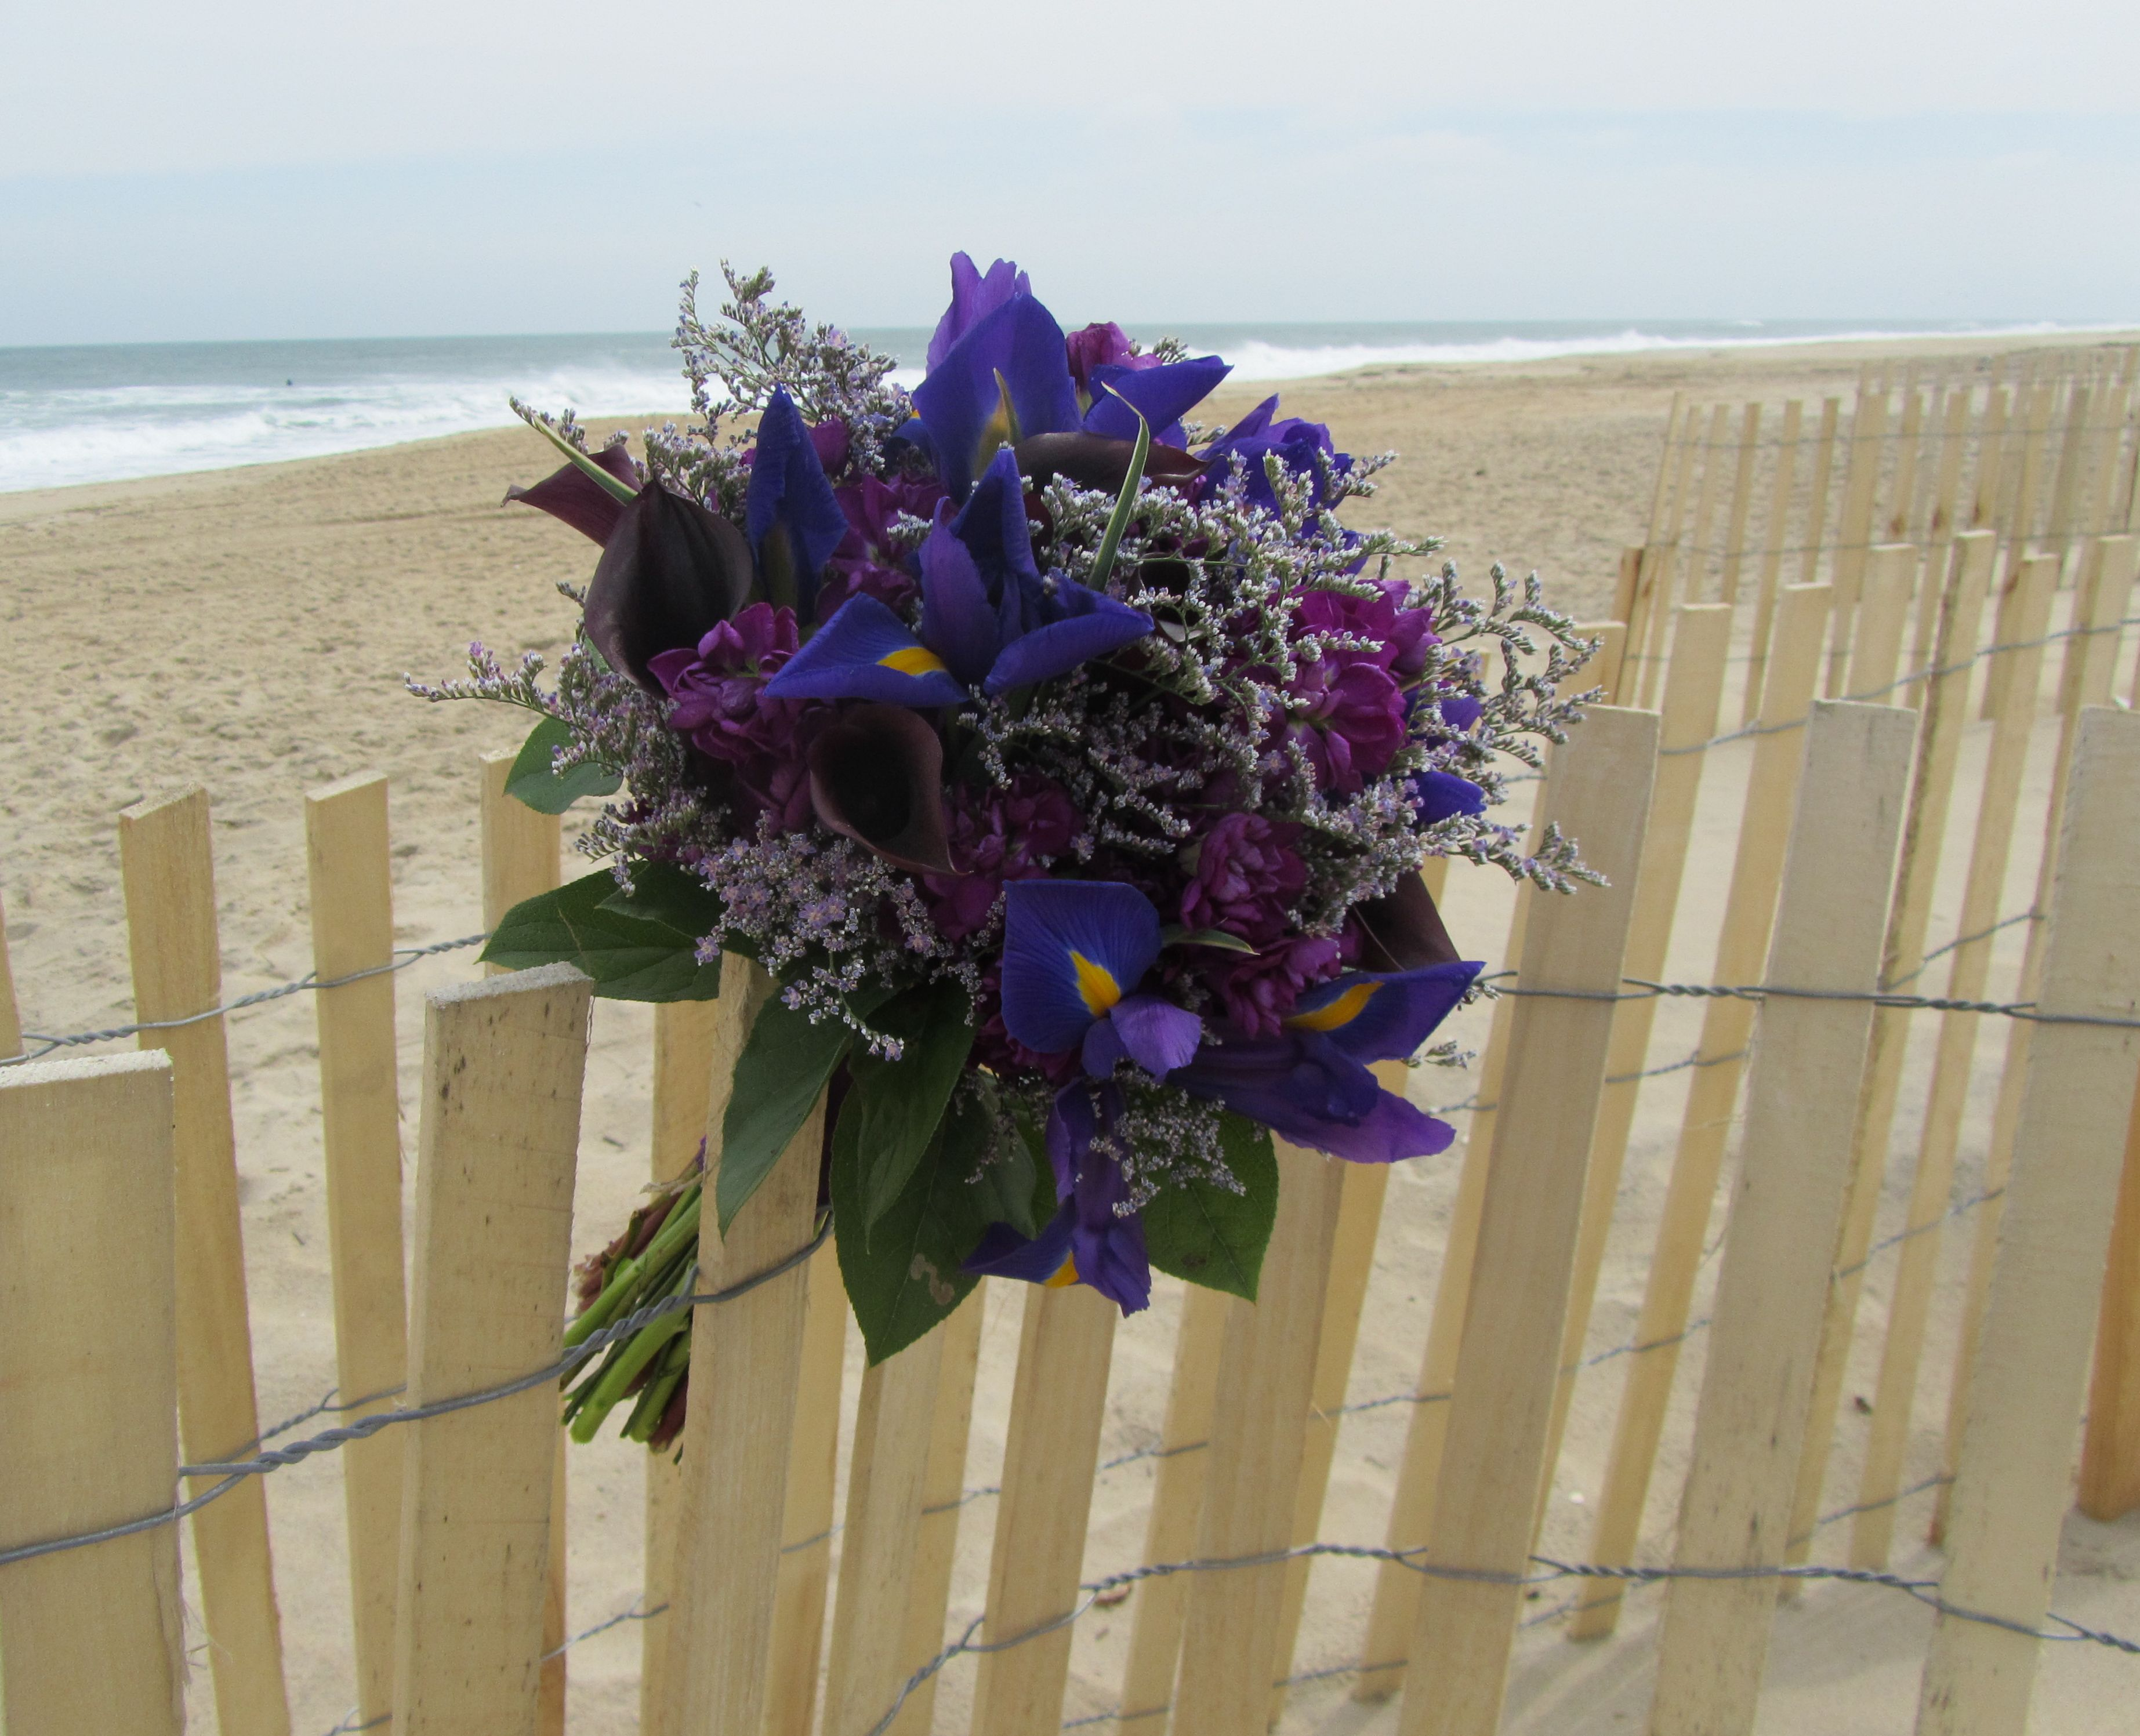 Limonium Is A Feathery Bluepurple Flower That Looks Marvelous As An